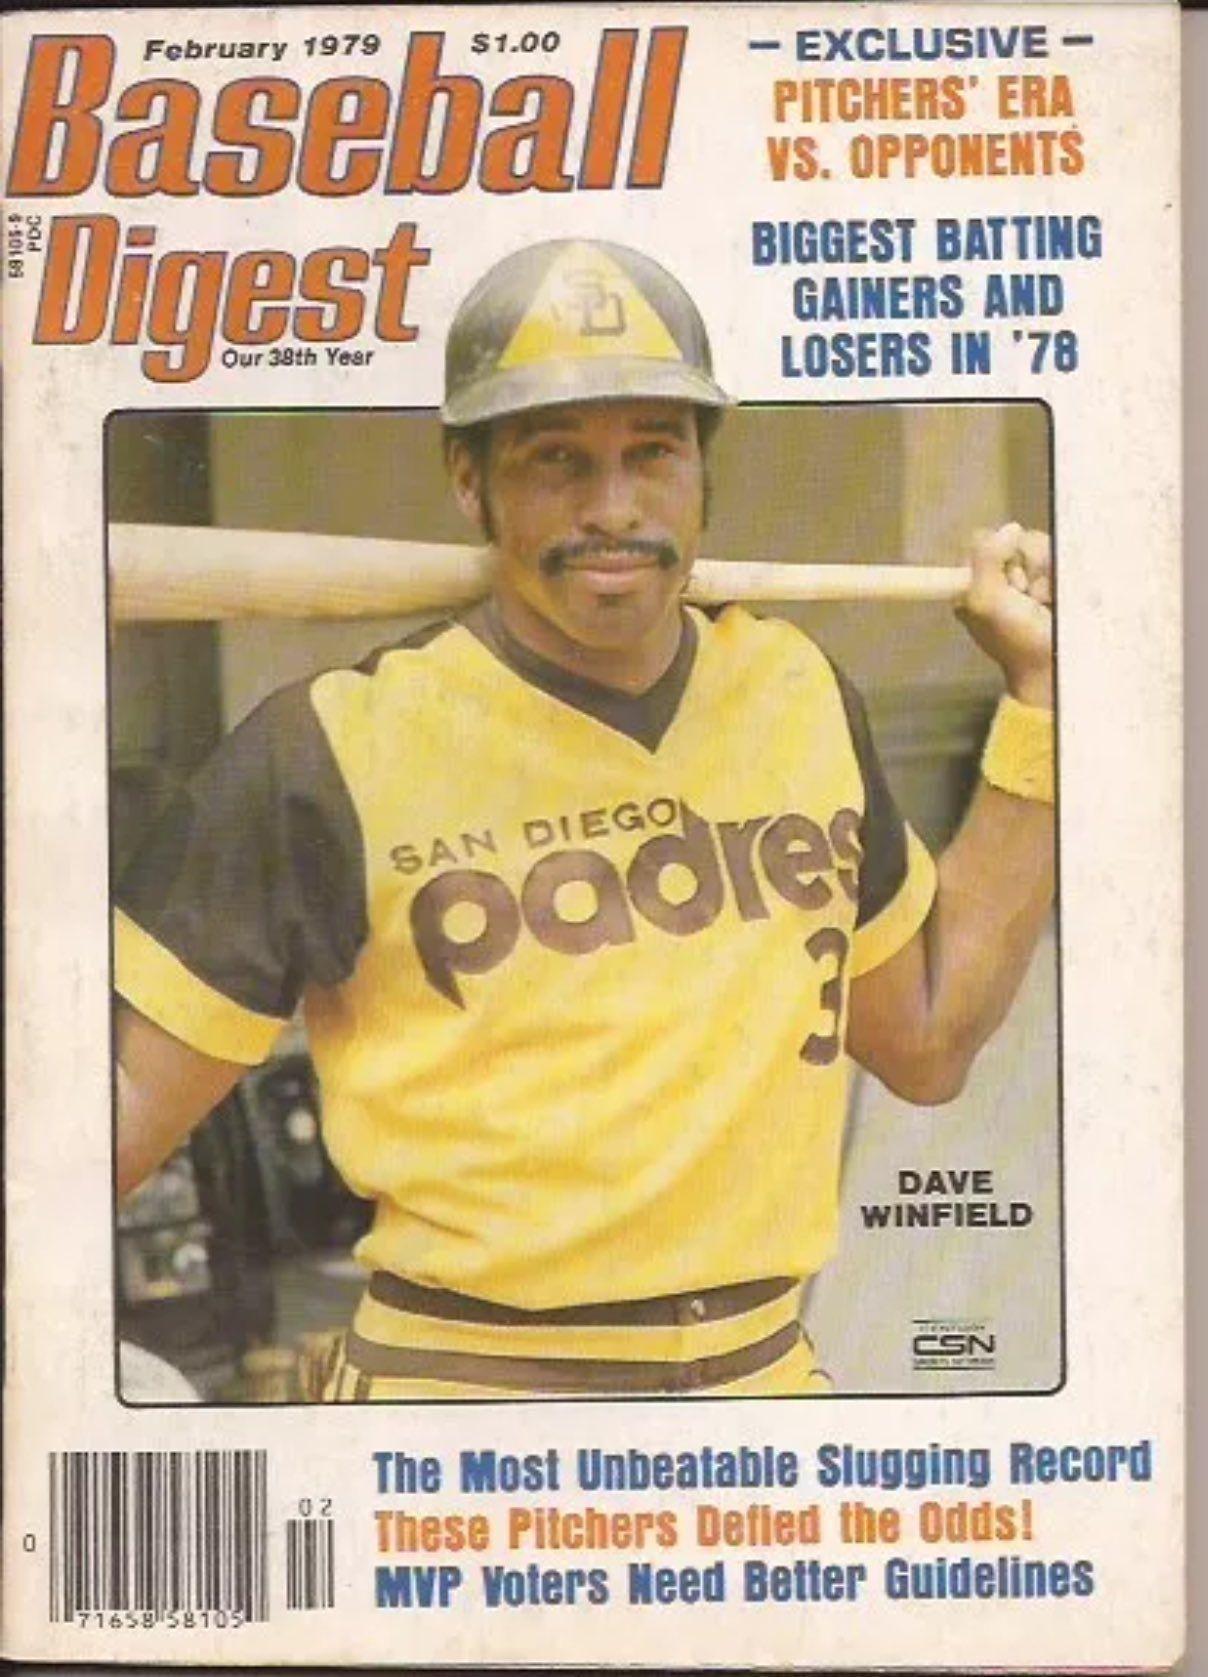 Super 70s Sports on Sports magazine, Baseball pitcher